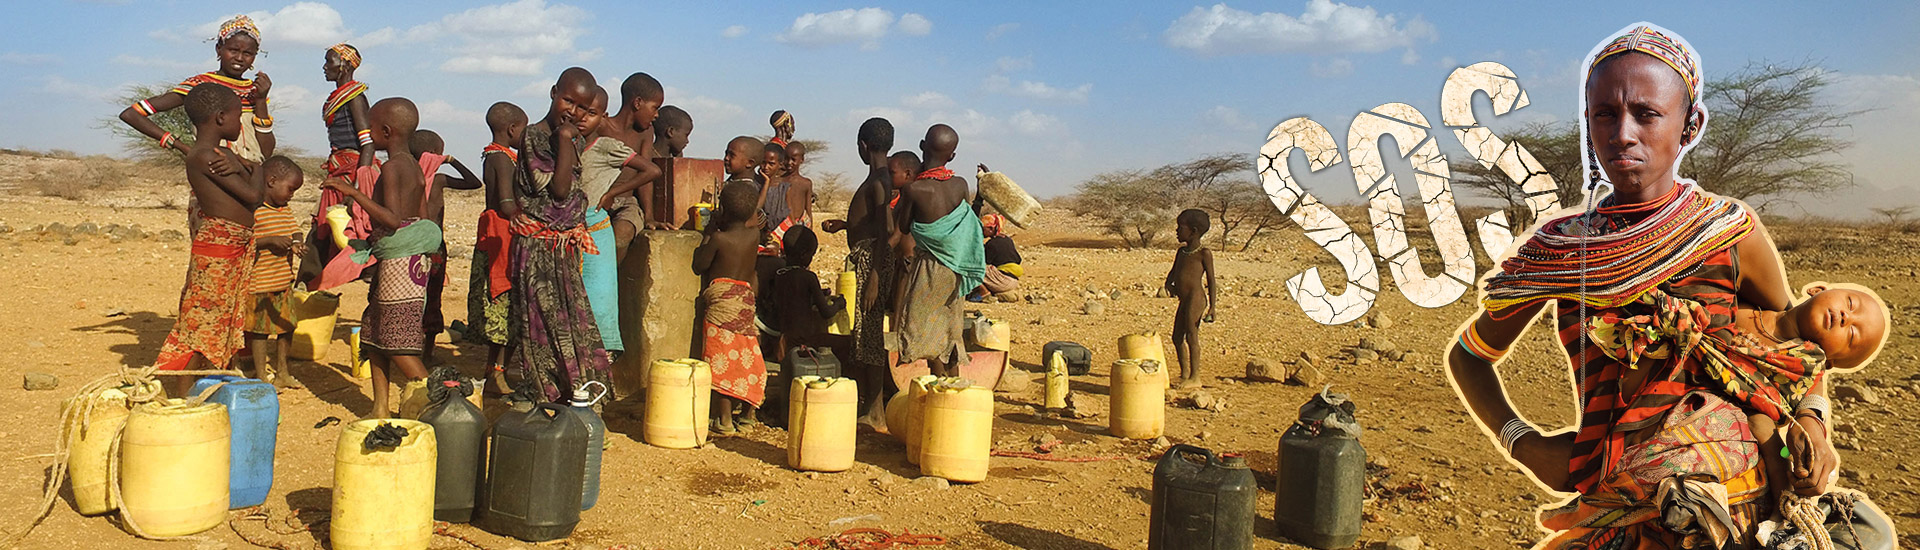 SOS: Necesitamos Agua